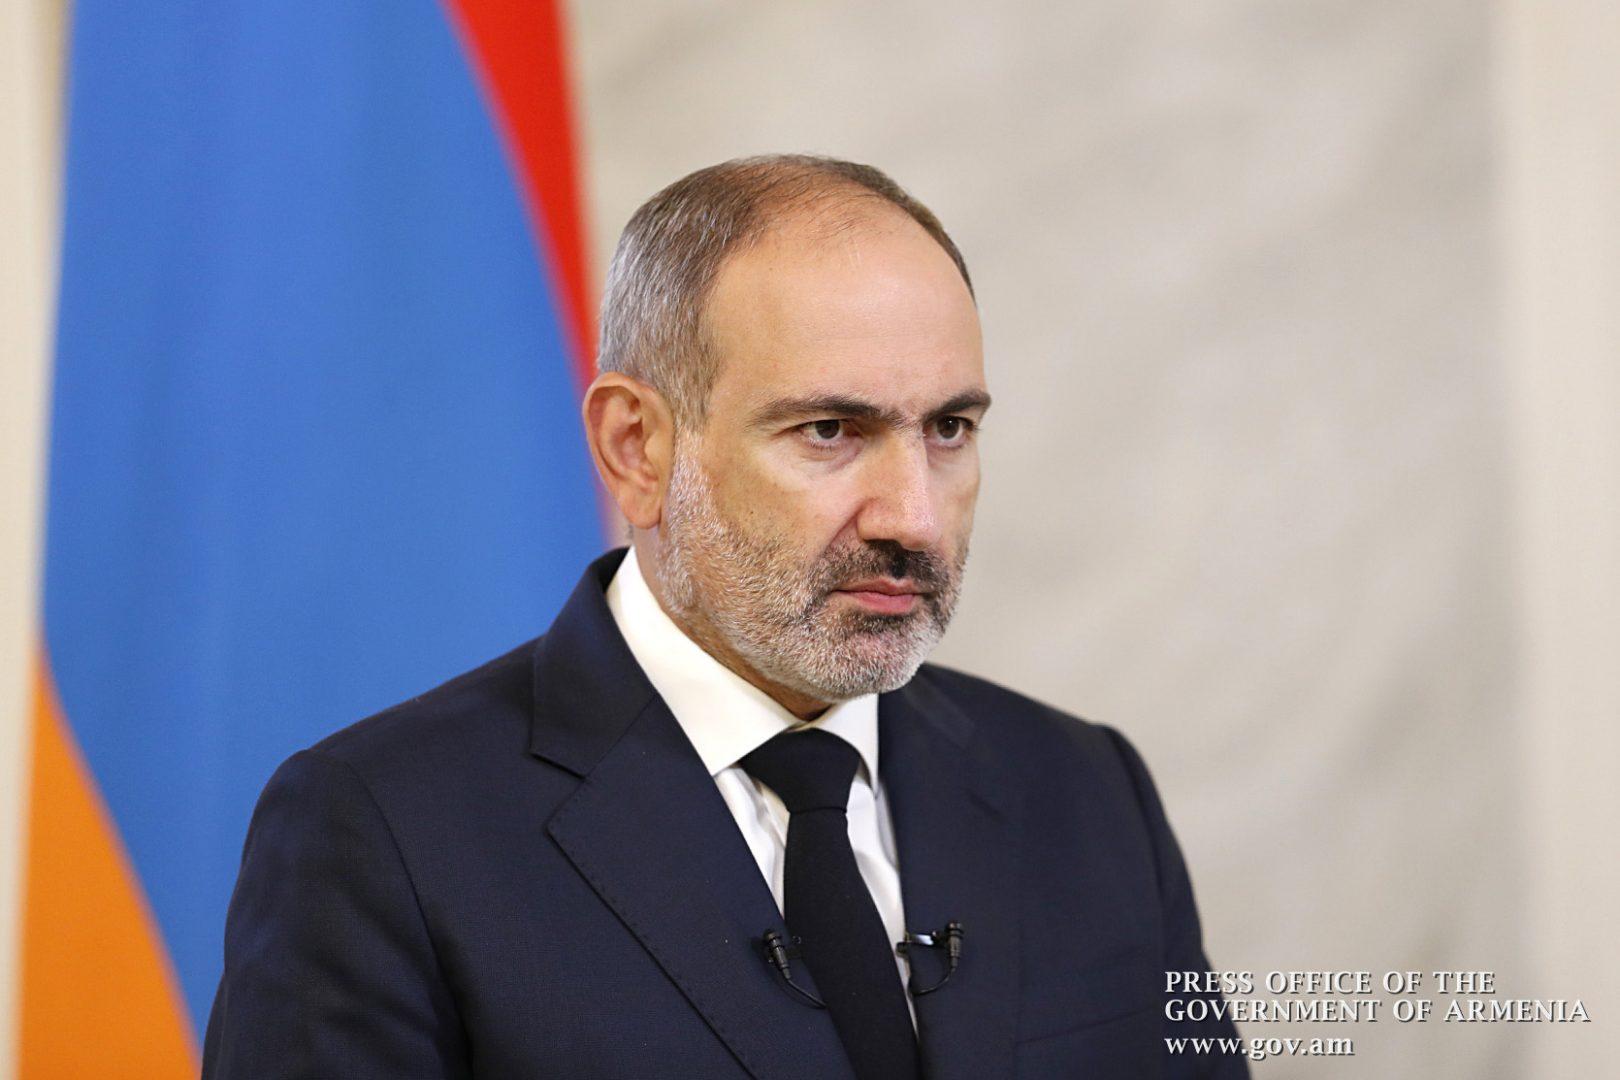 Armenian PM Announces End to Nagorno-Karabakh Hostilities